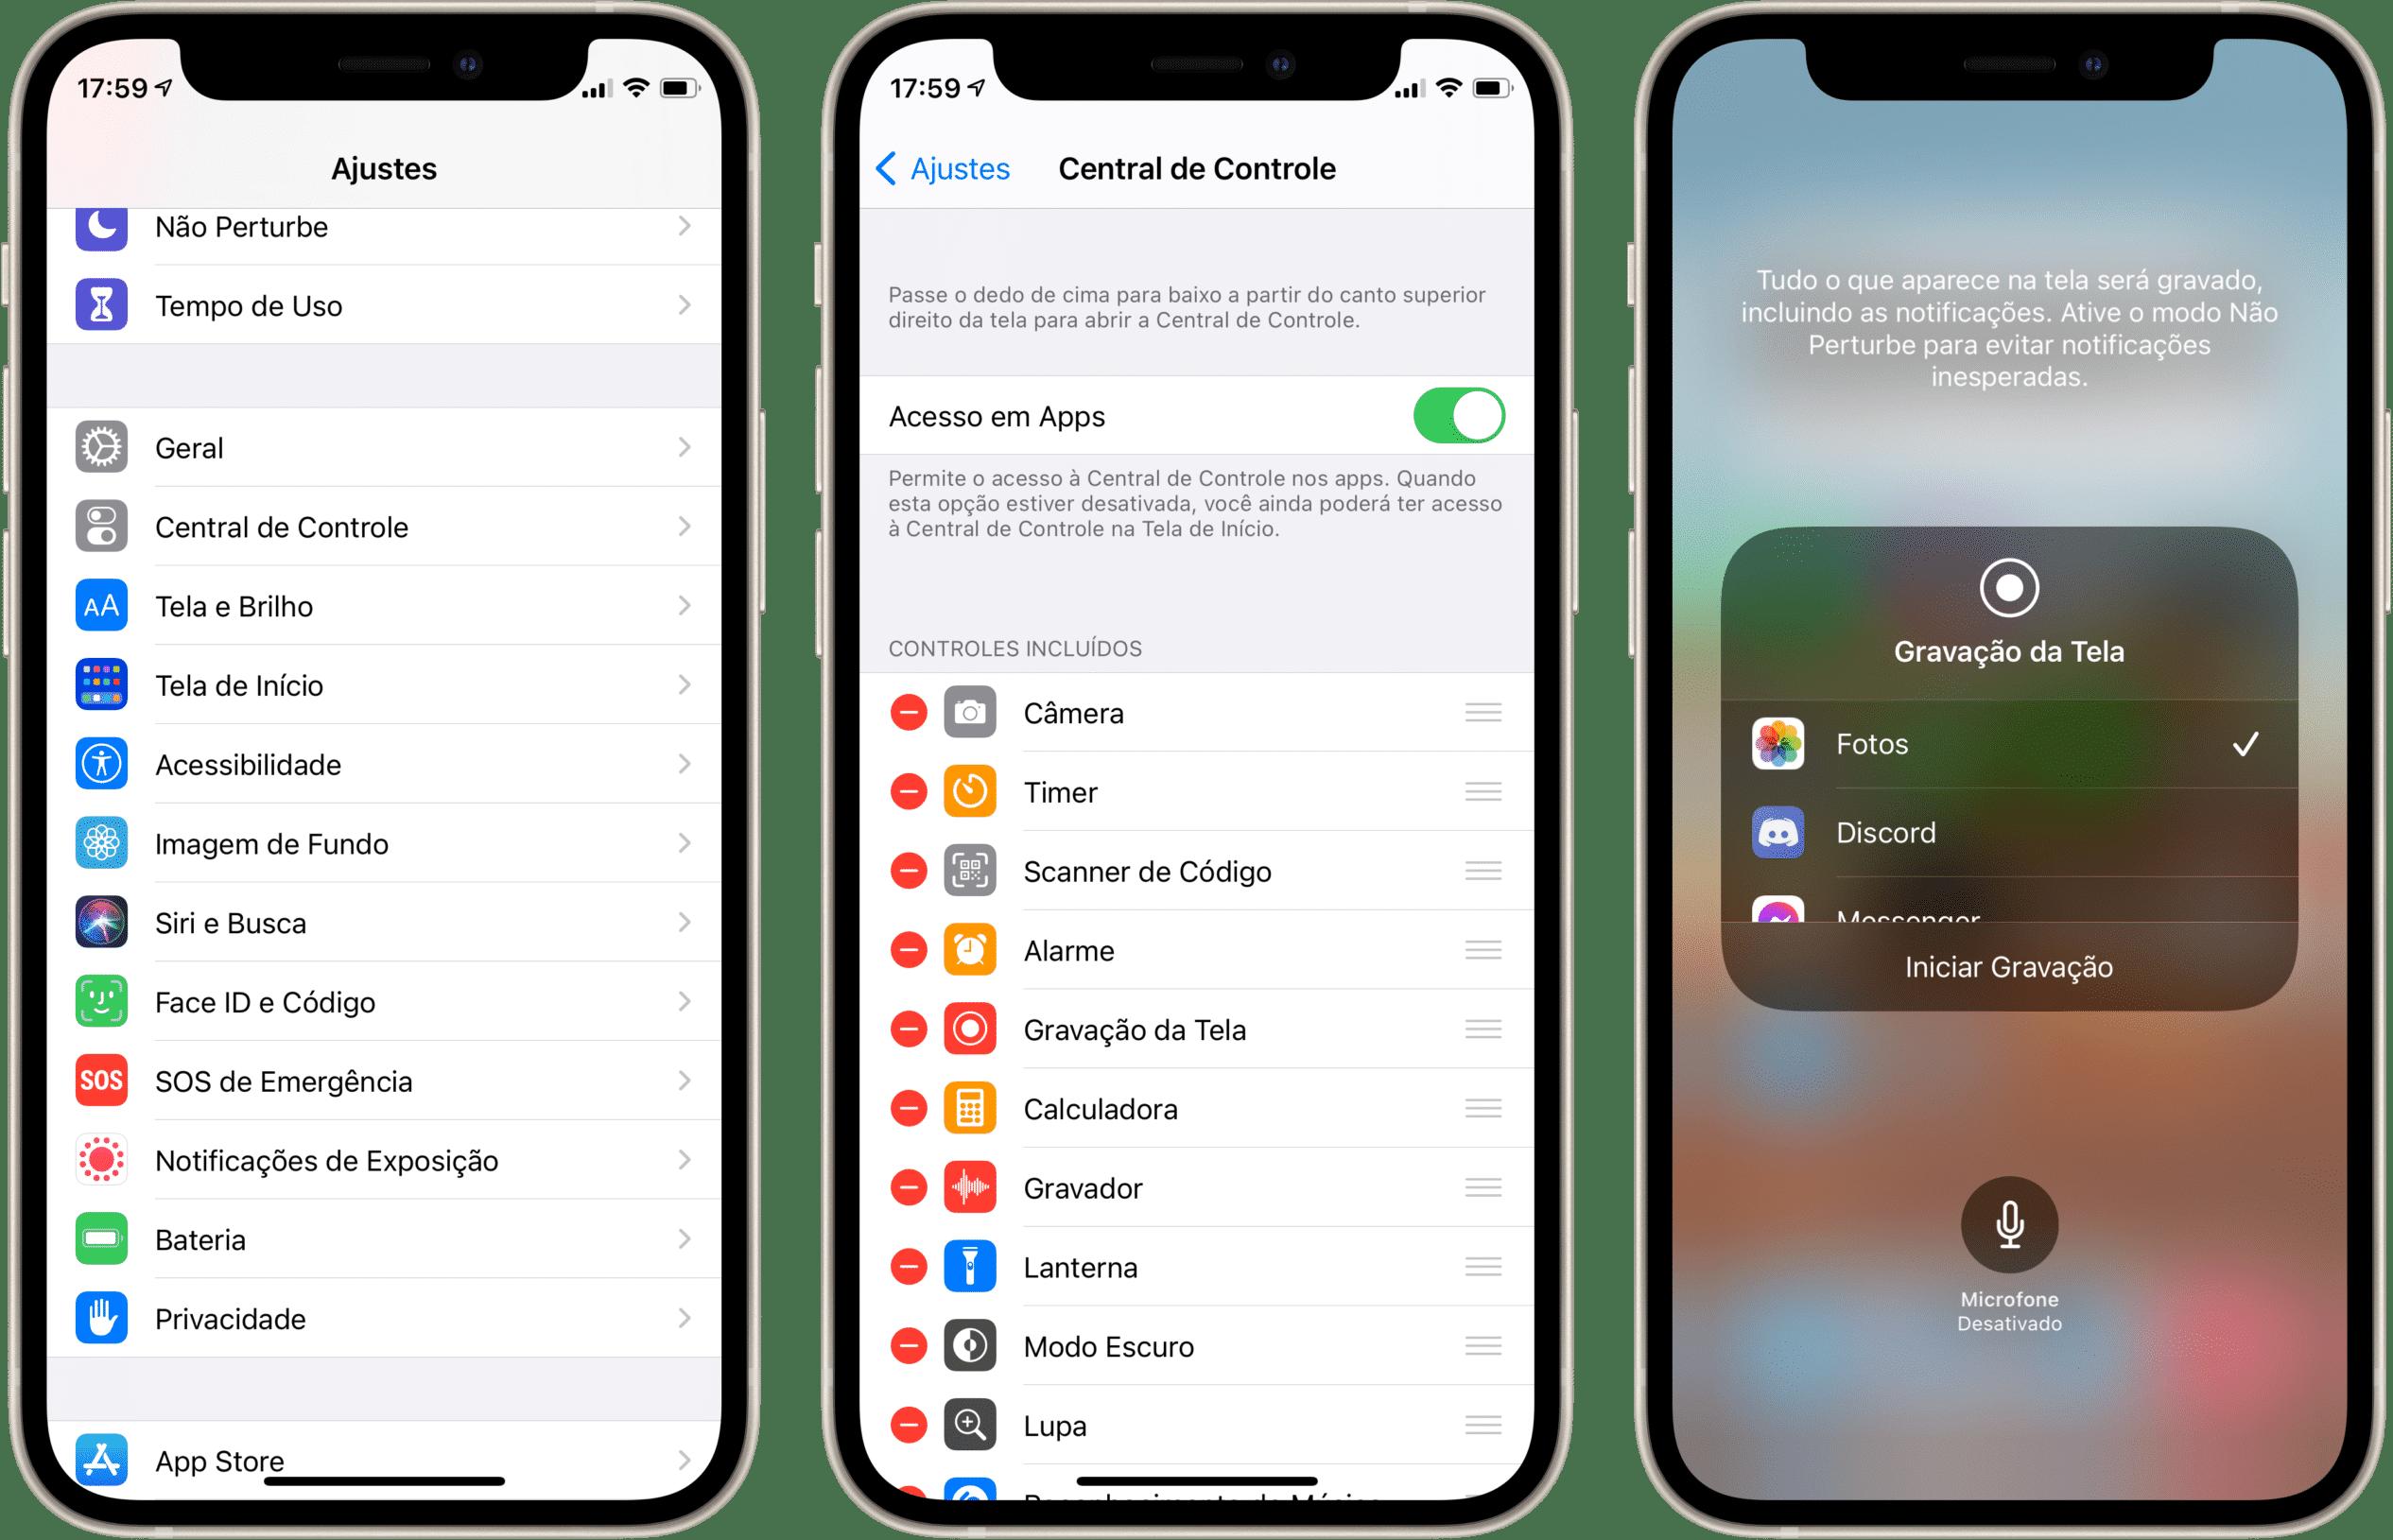 Gravando a tela do iPhone